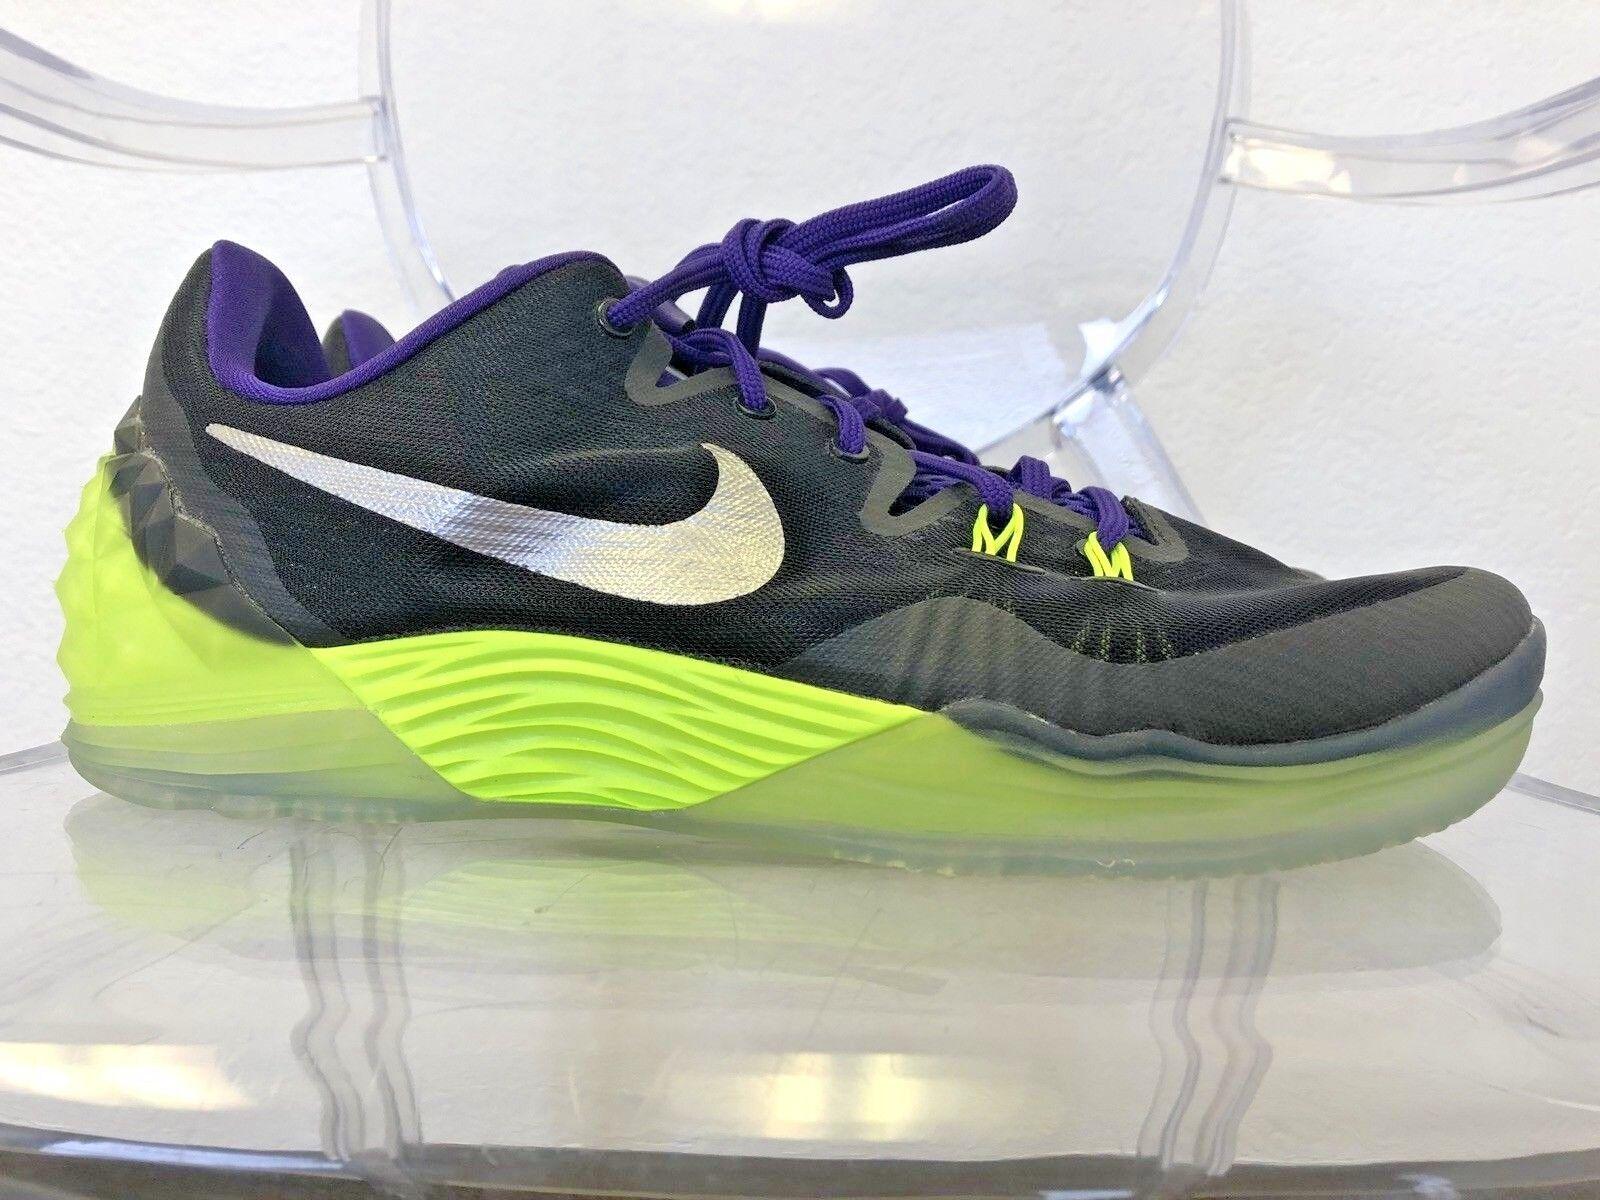 Nike MEN'S ZOOM KOBE VENOMENON 5 Size 10.5 Black Basketball shoes 749884-005